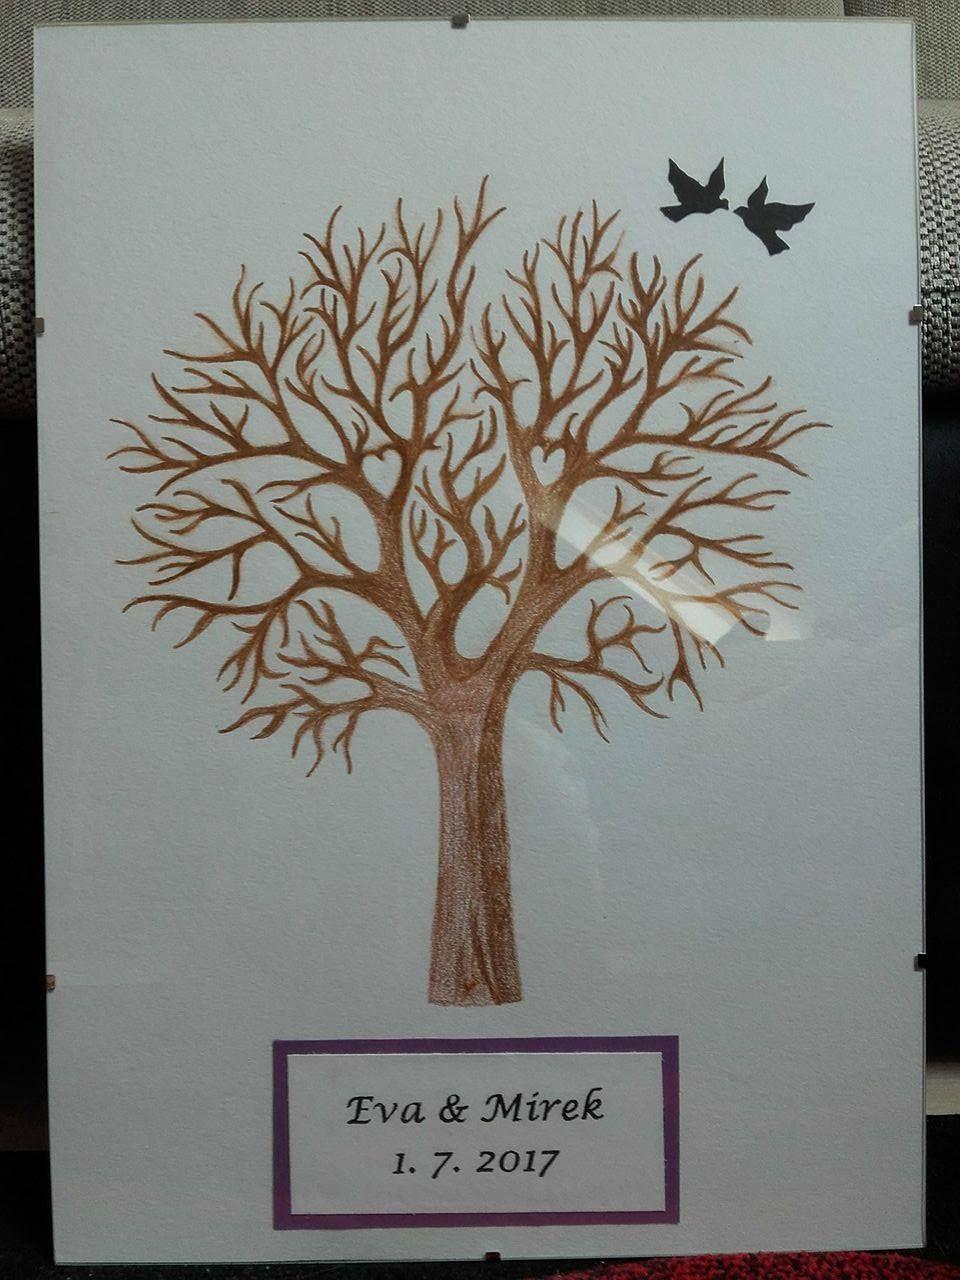 Svatebni Strom Tradicni S Leticimi Ptacky Nabizim Kreslene Ci